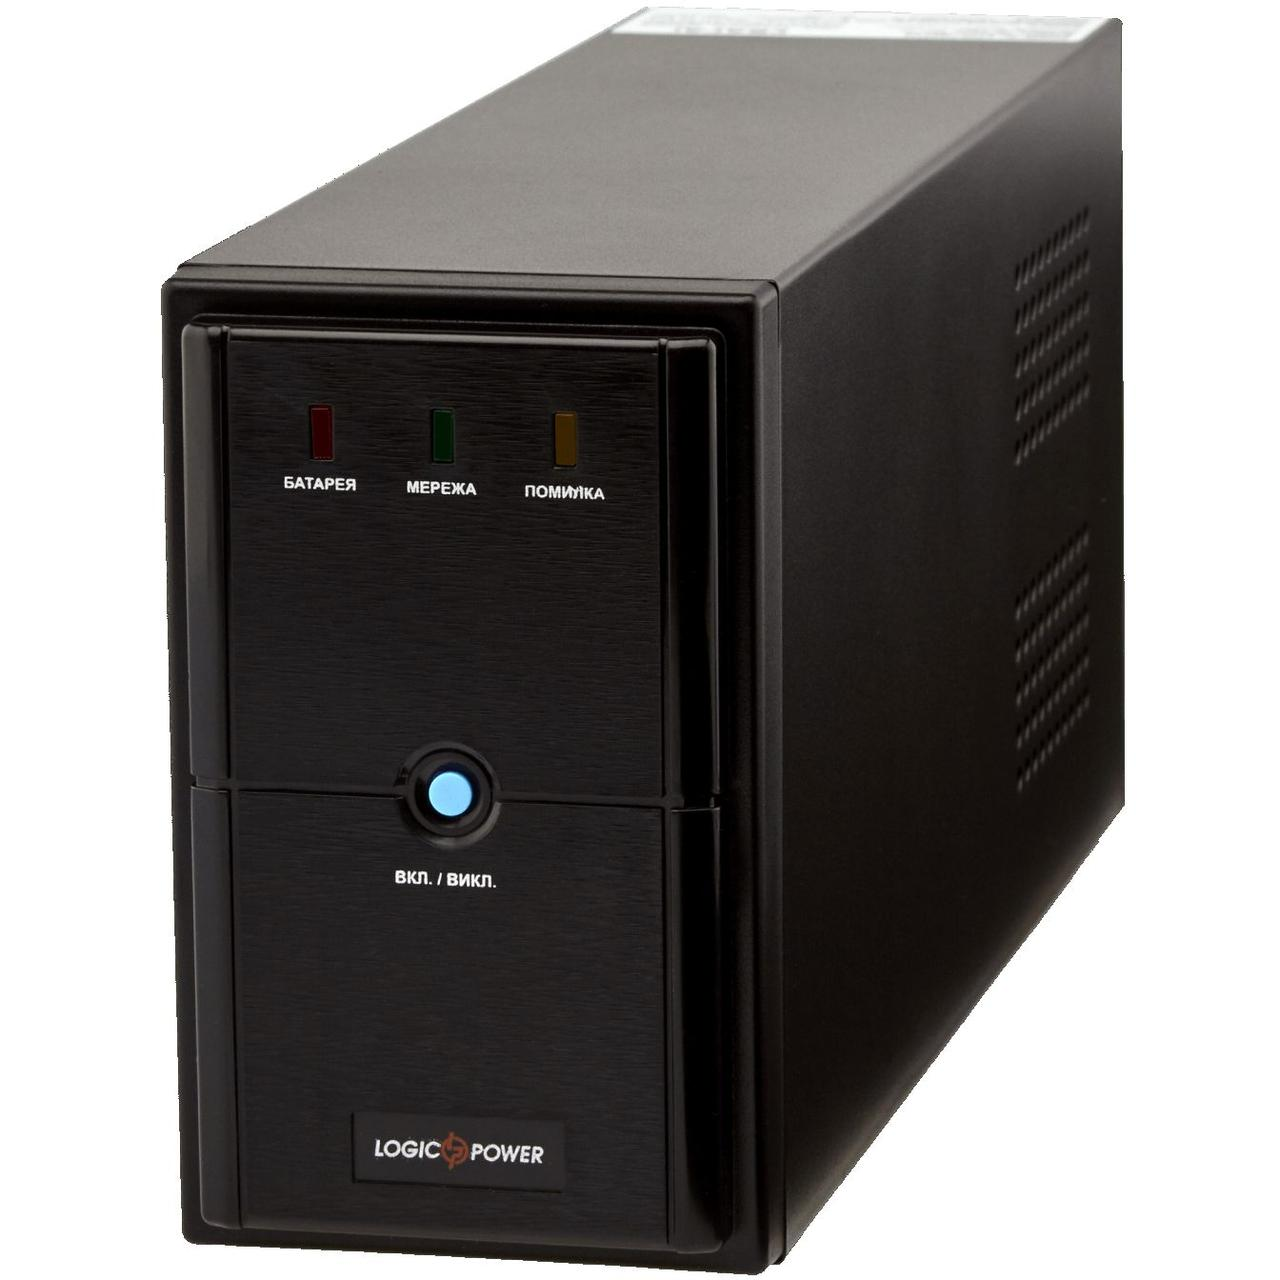 ИБП LogicPower LPM-1100VA, Lin.int., AVR, 3 x евро, металл